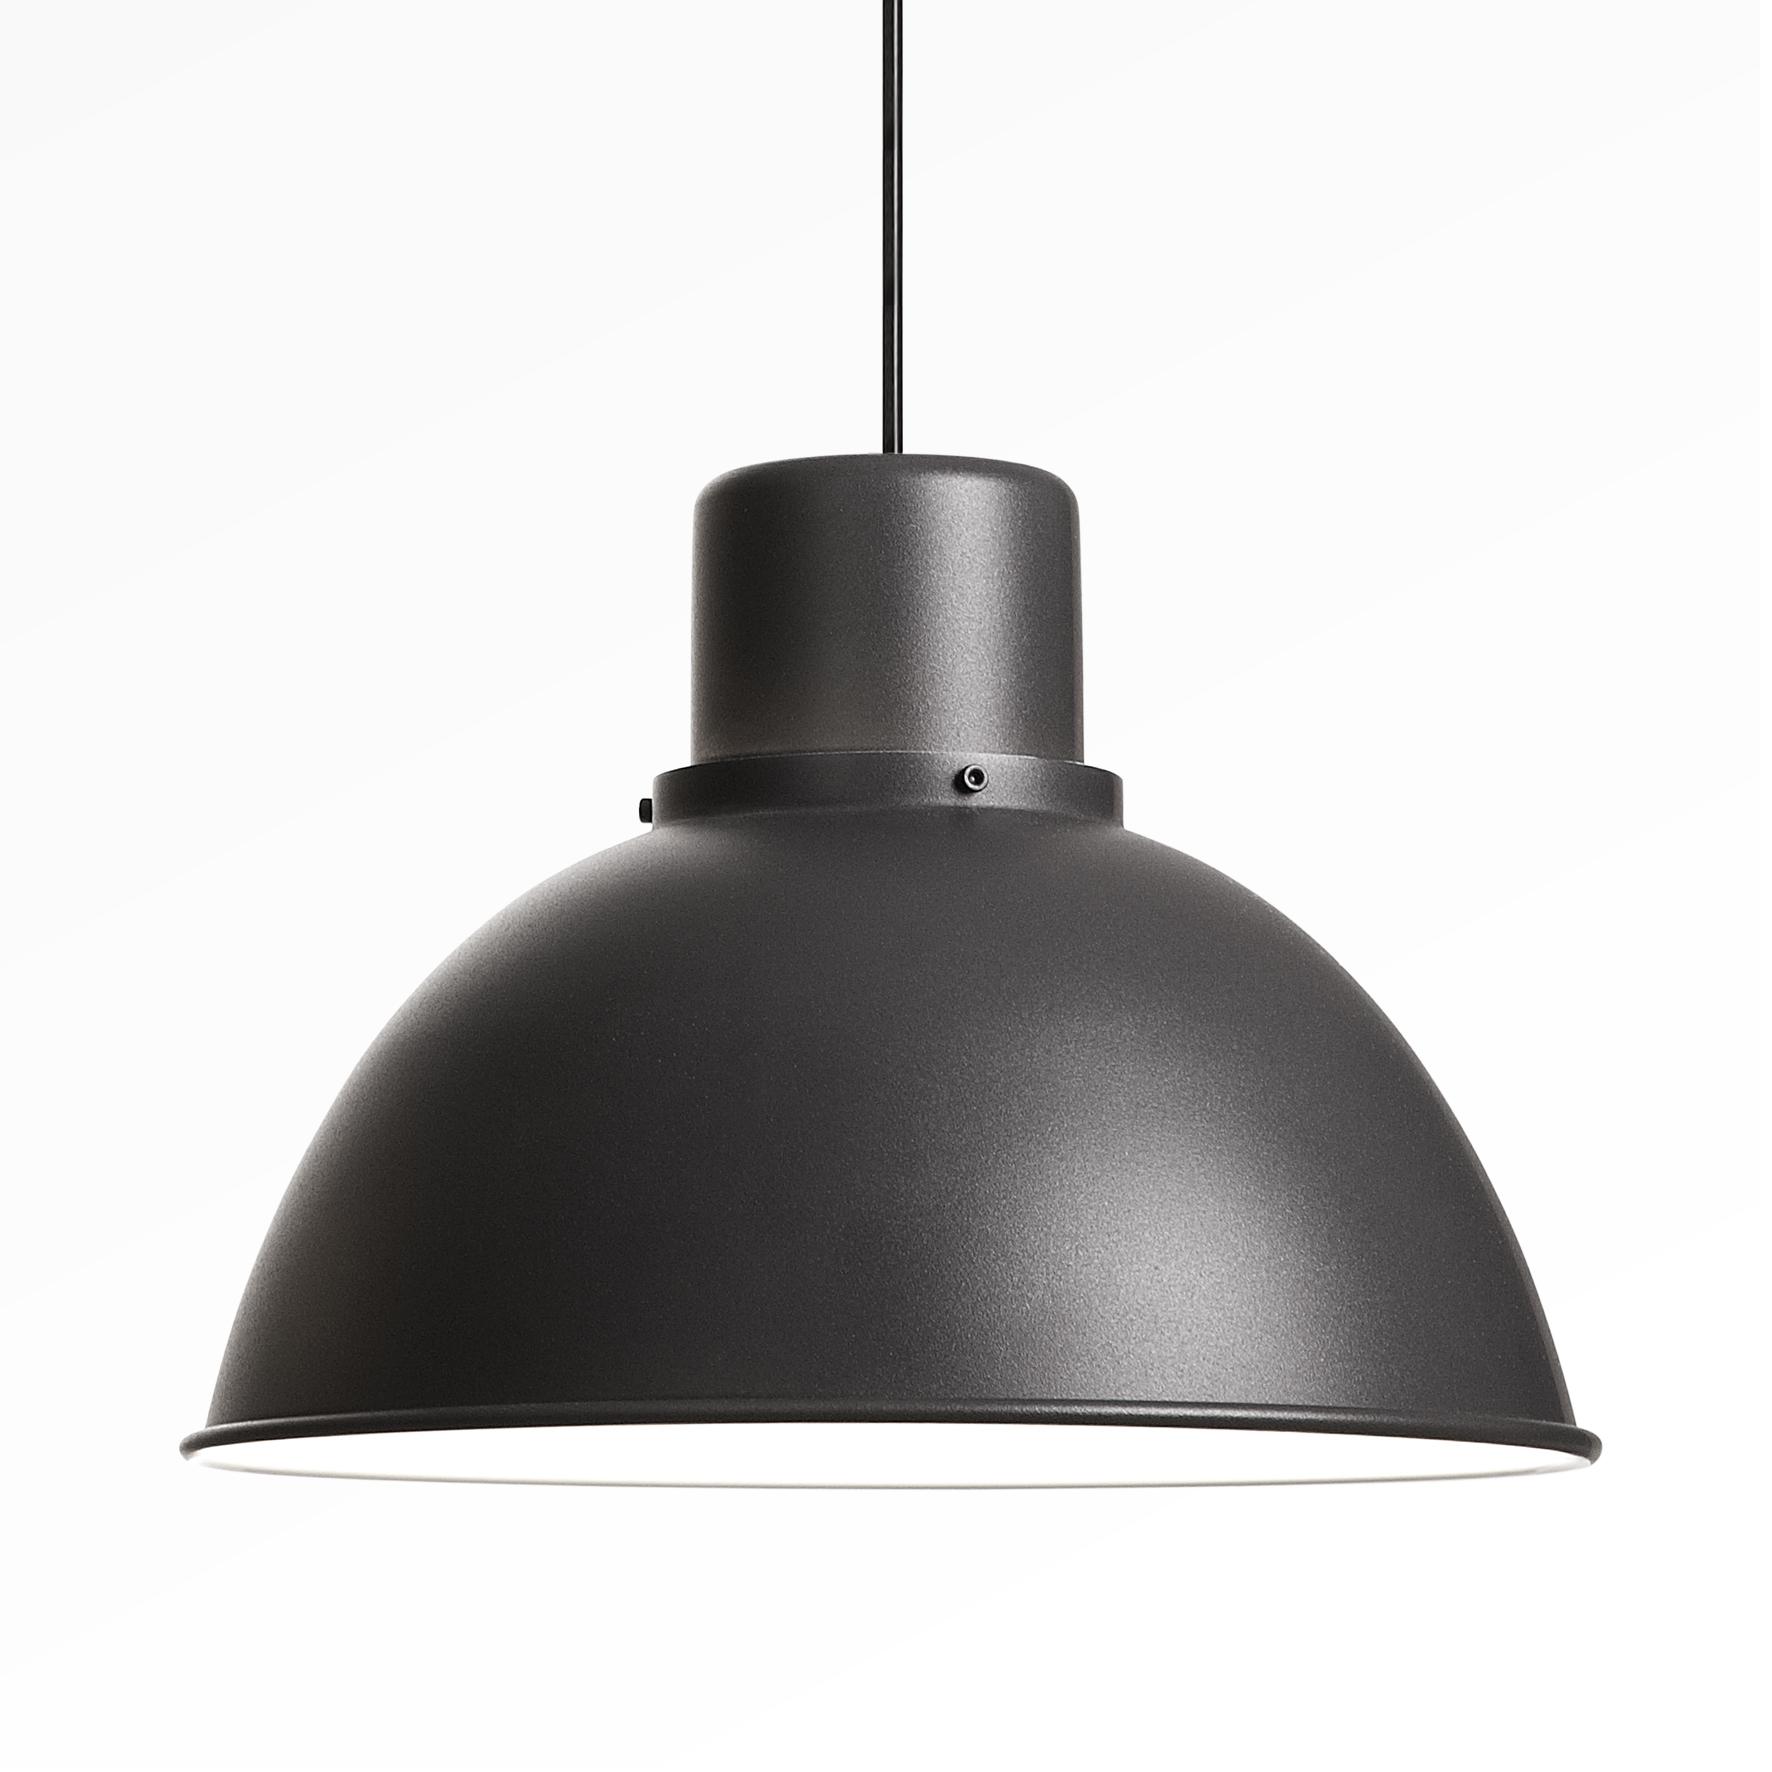 lampa-wiszaca-tar-reflex-maxi-ideal-design